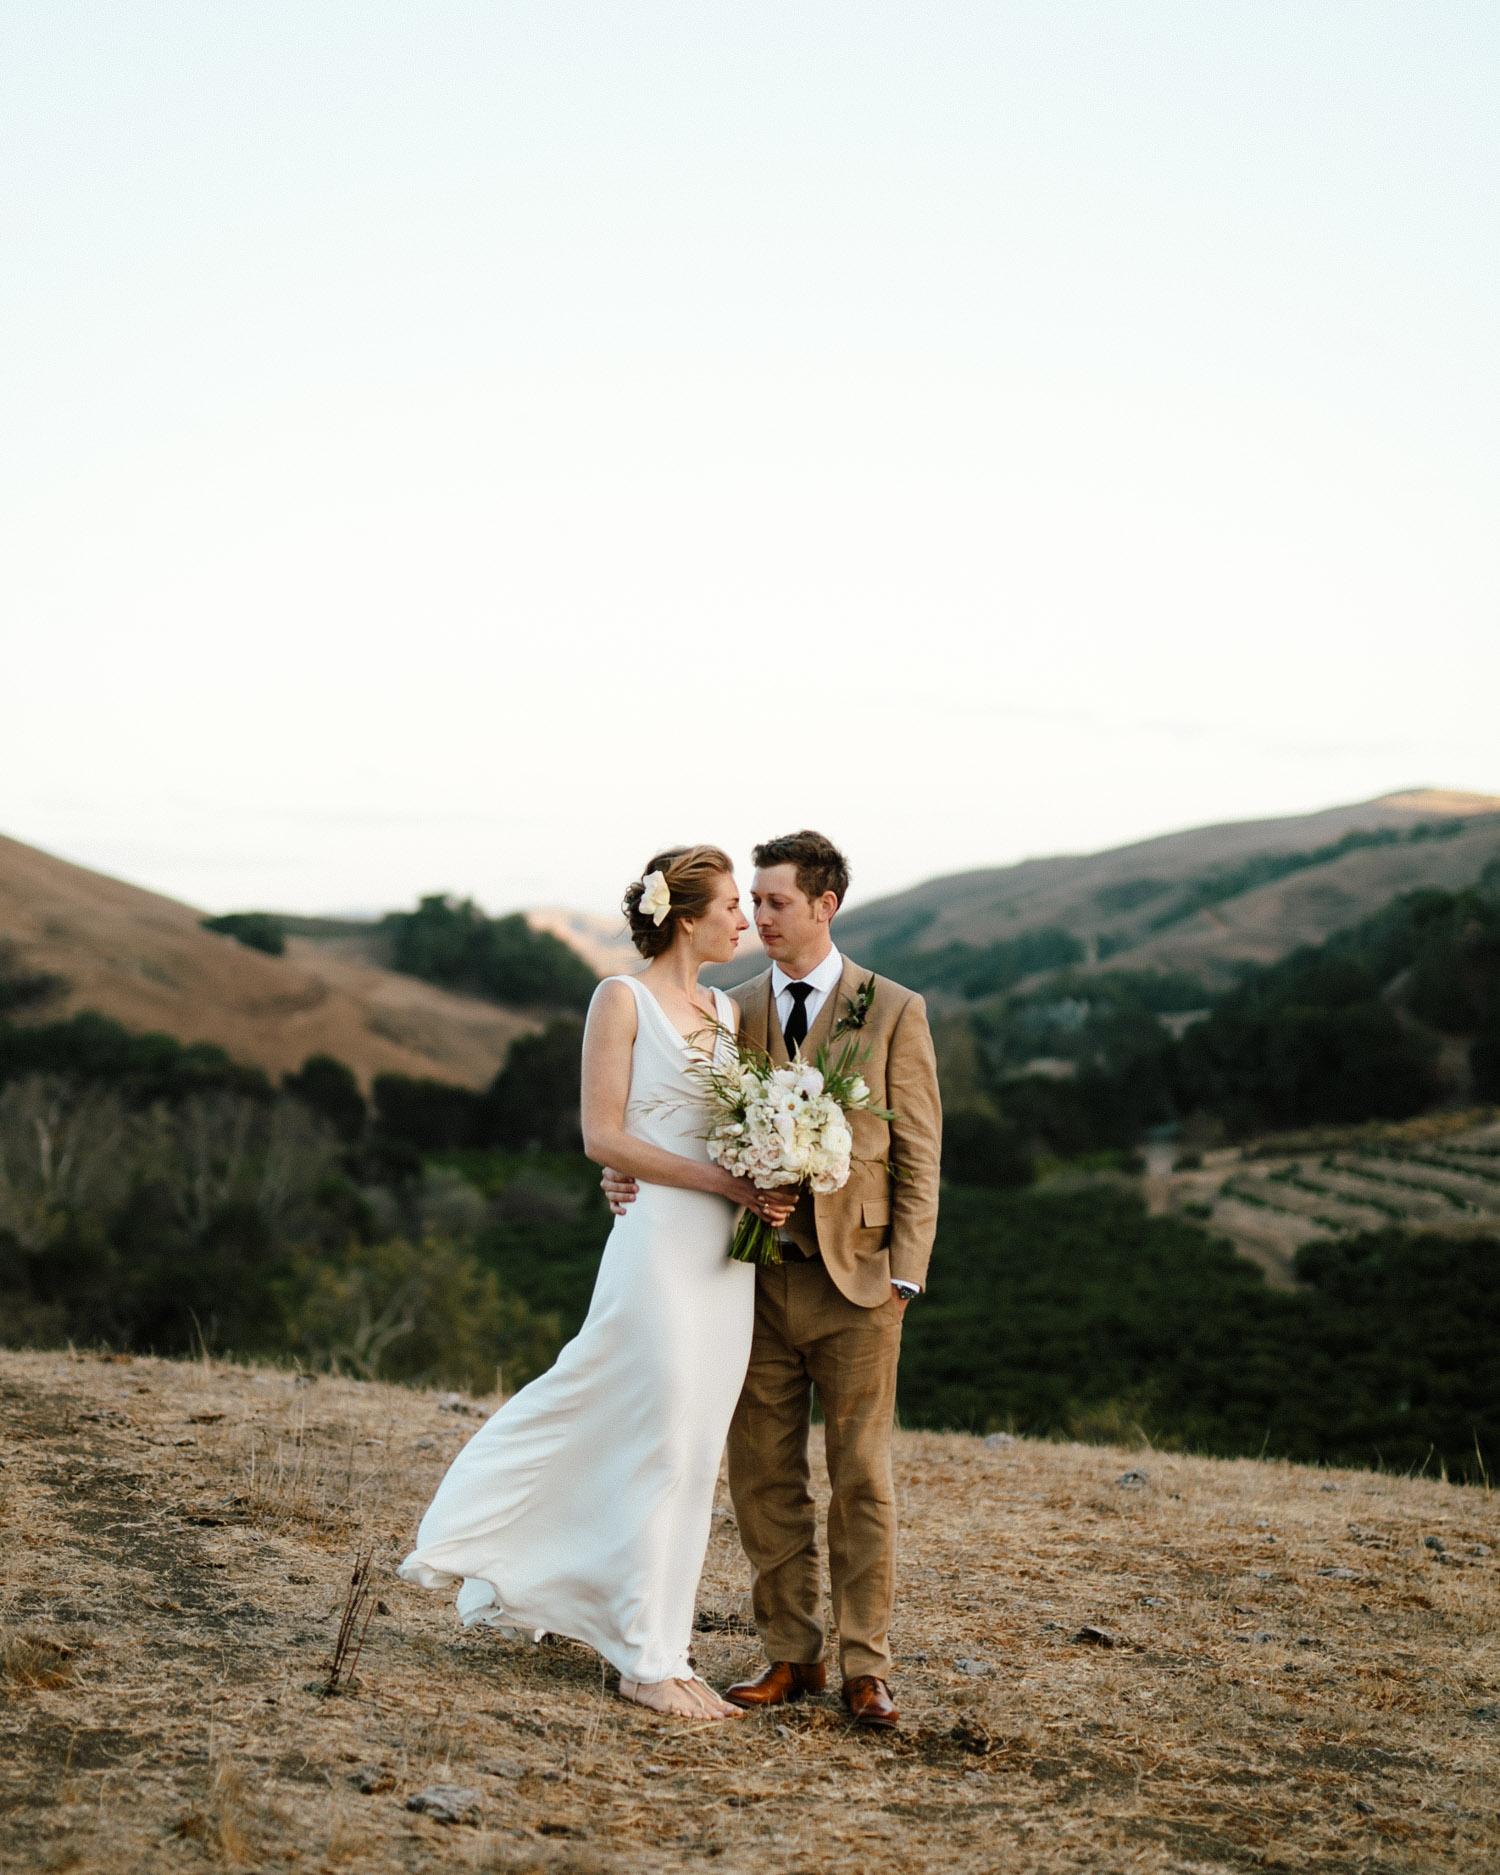 Destination Wedding Photographer, Cayucos, CA  - The Gathering Season x weareleoandkat 091.JPG